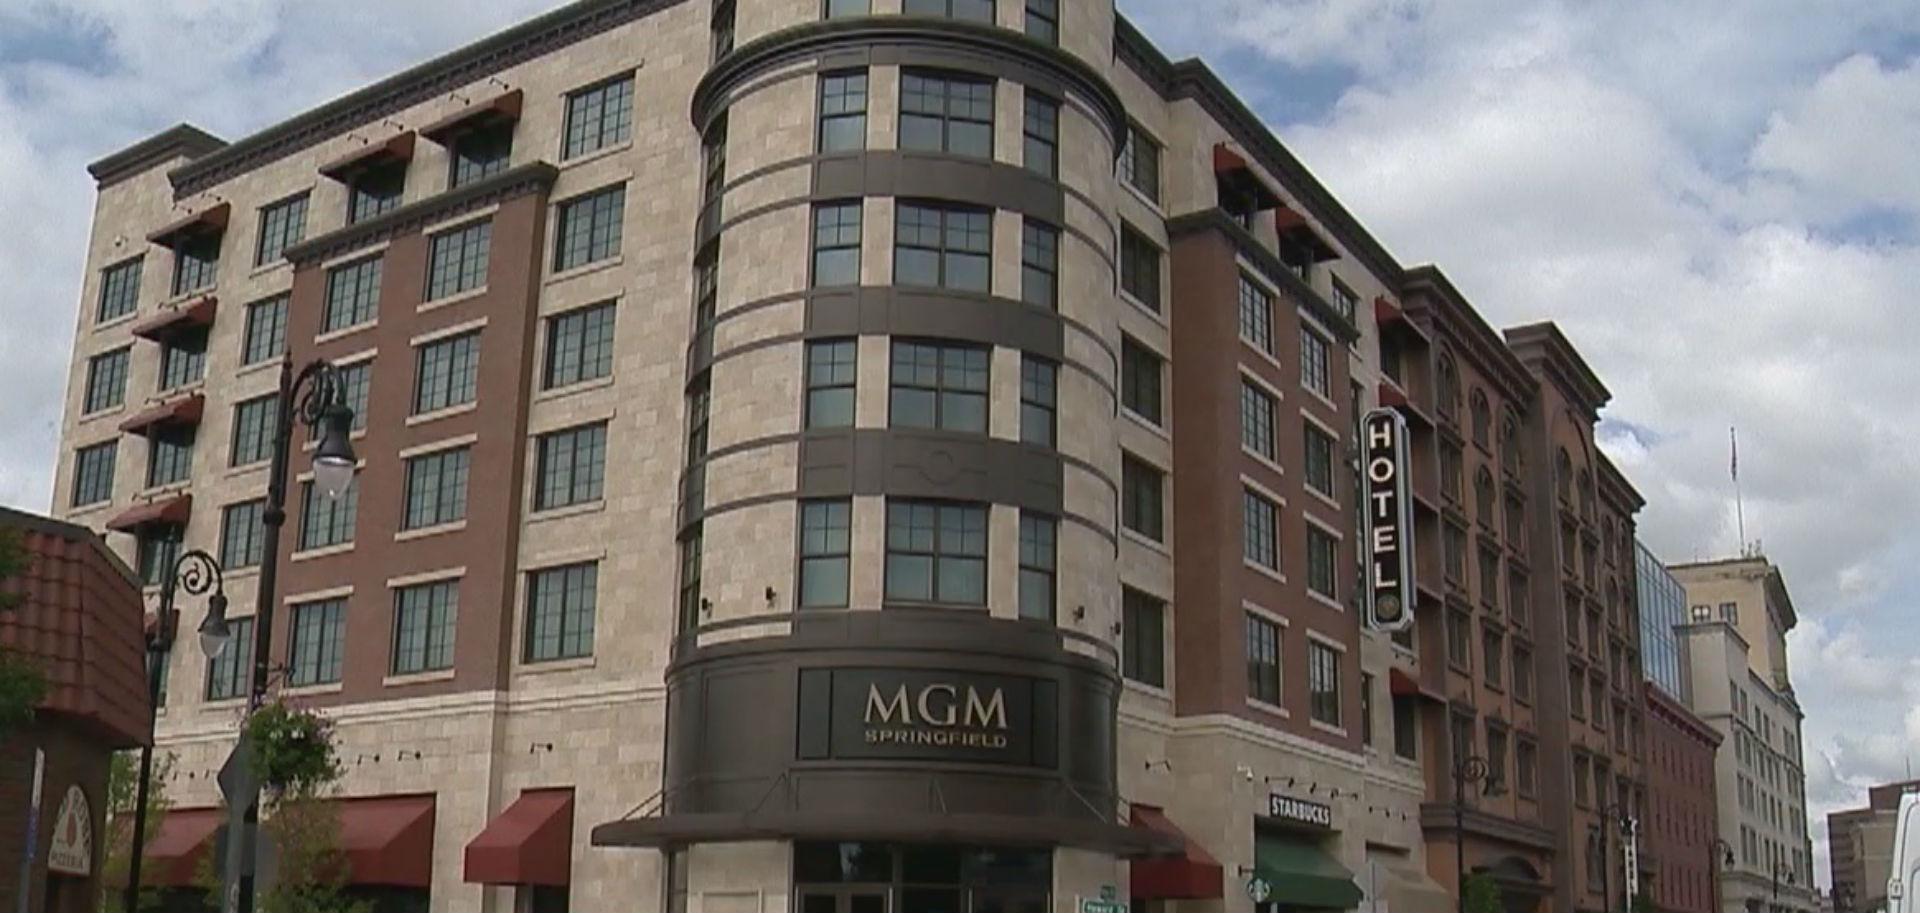 MGM Springfield_1536849941425.jpg.jpg